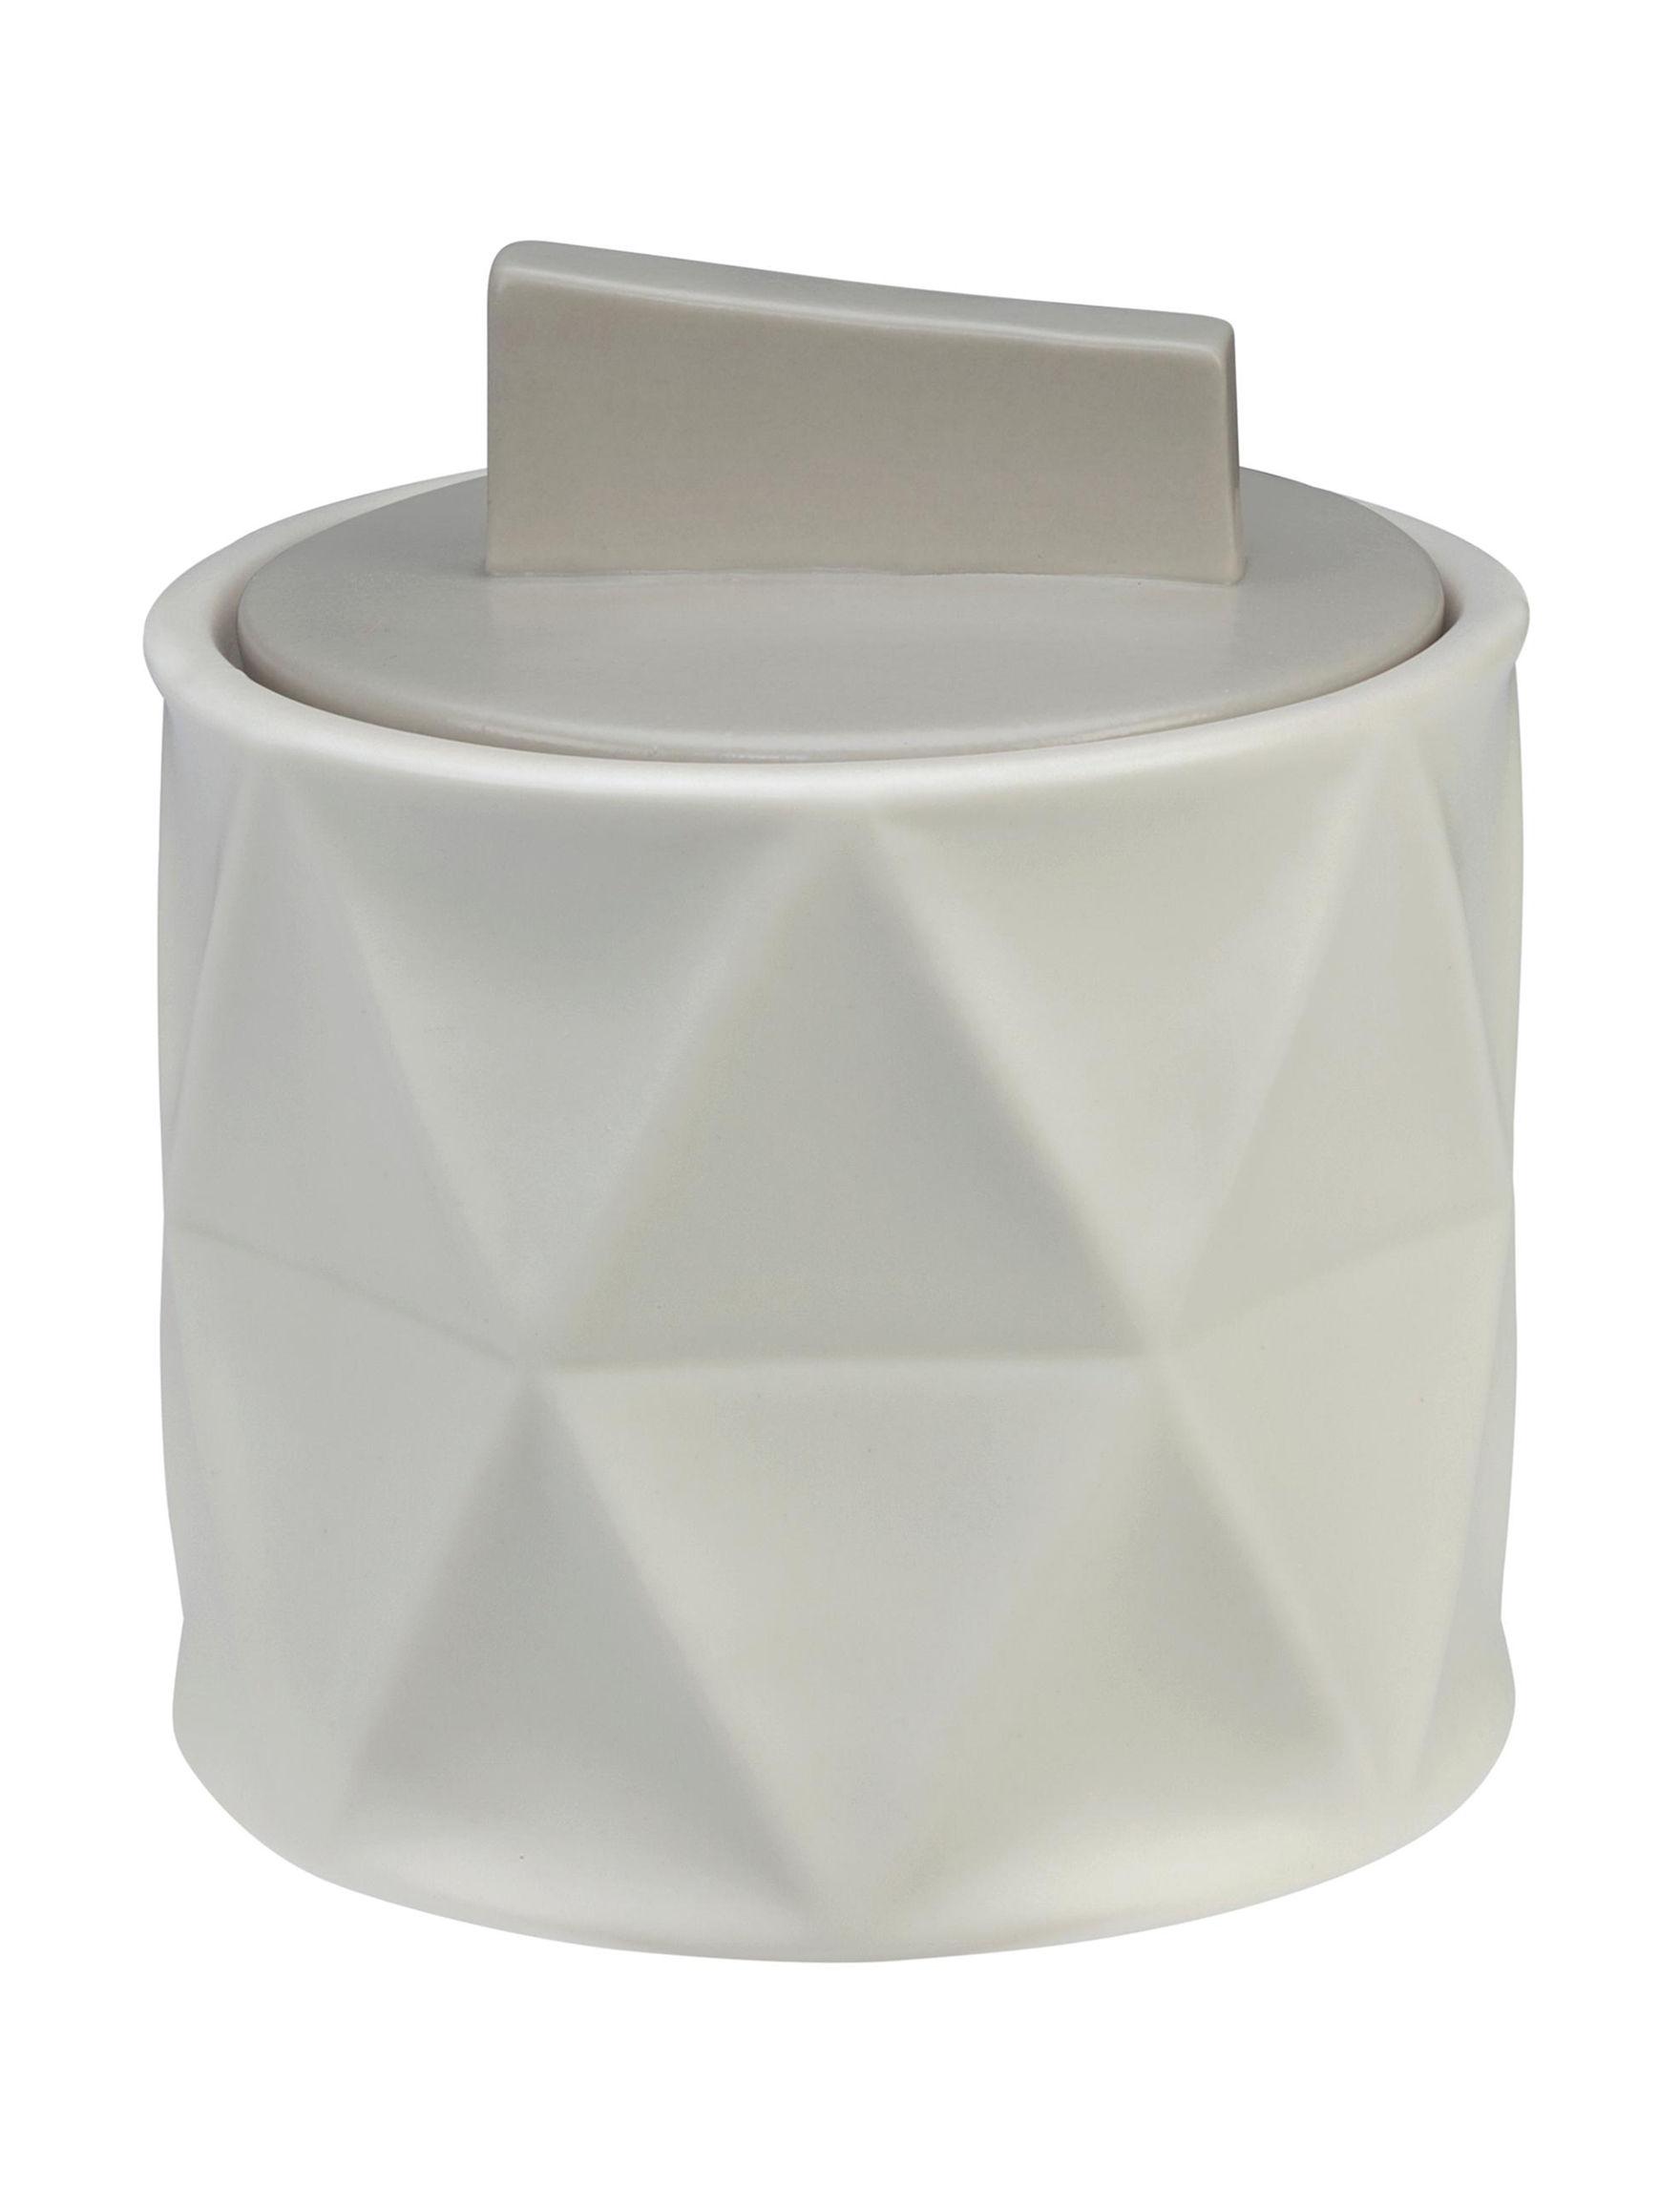 Creativeware Natural Trays & Jars Bath Accessories